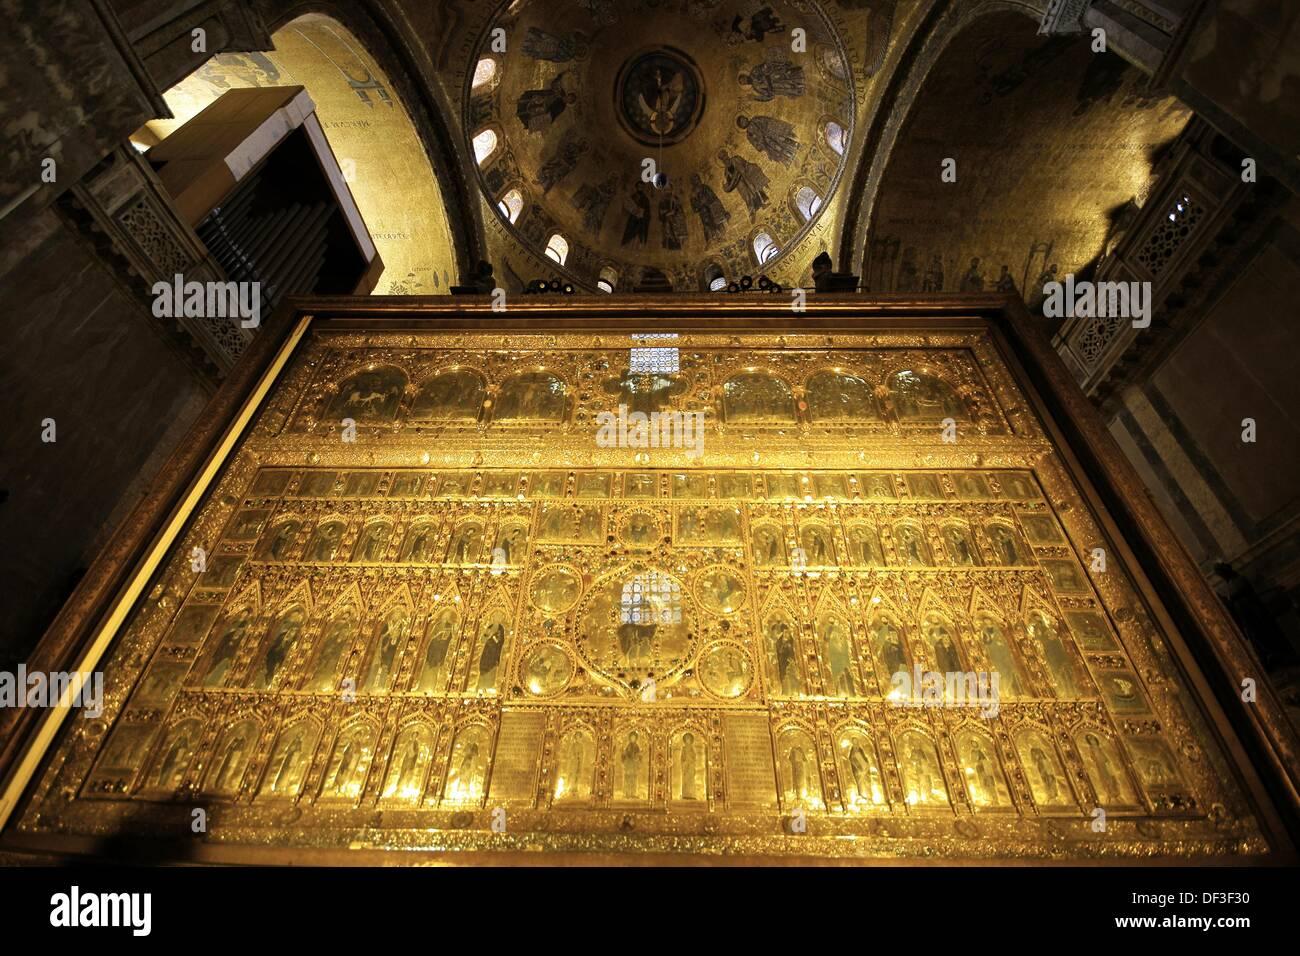 Golden altarpiece pala d oro basilica of san marcos piazza for Pala de oro